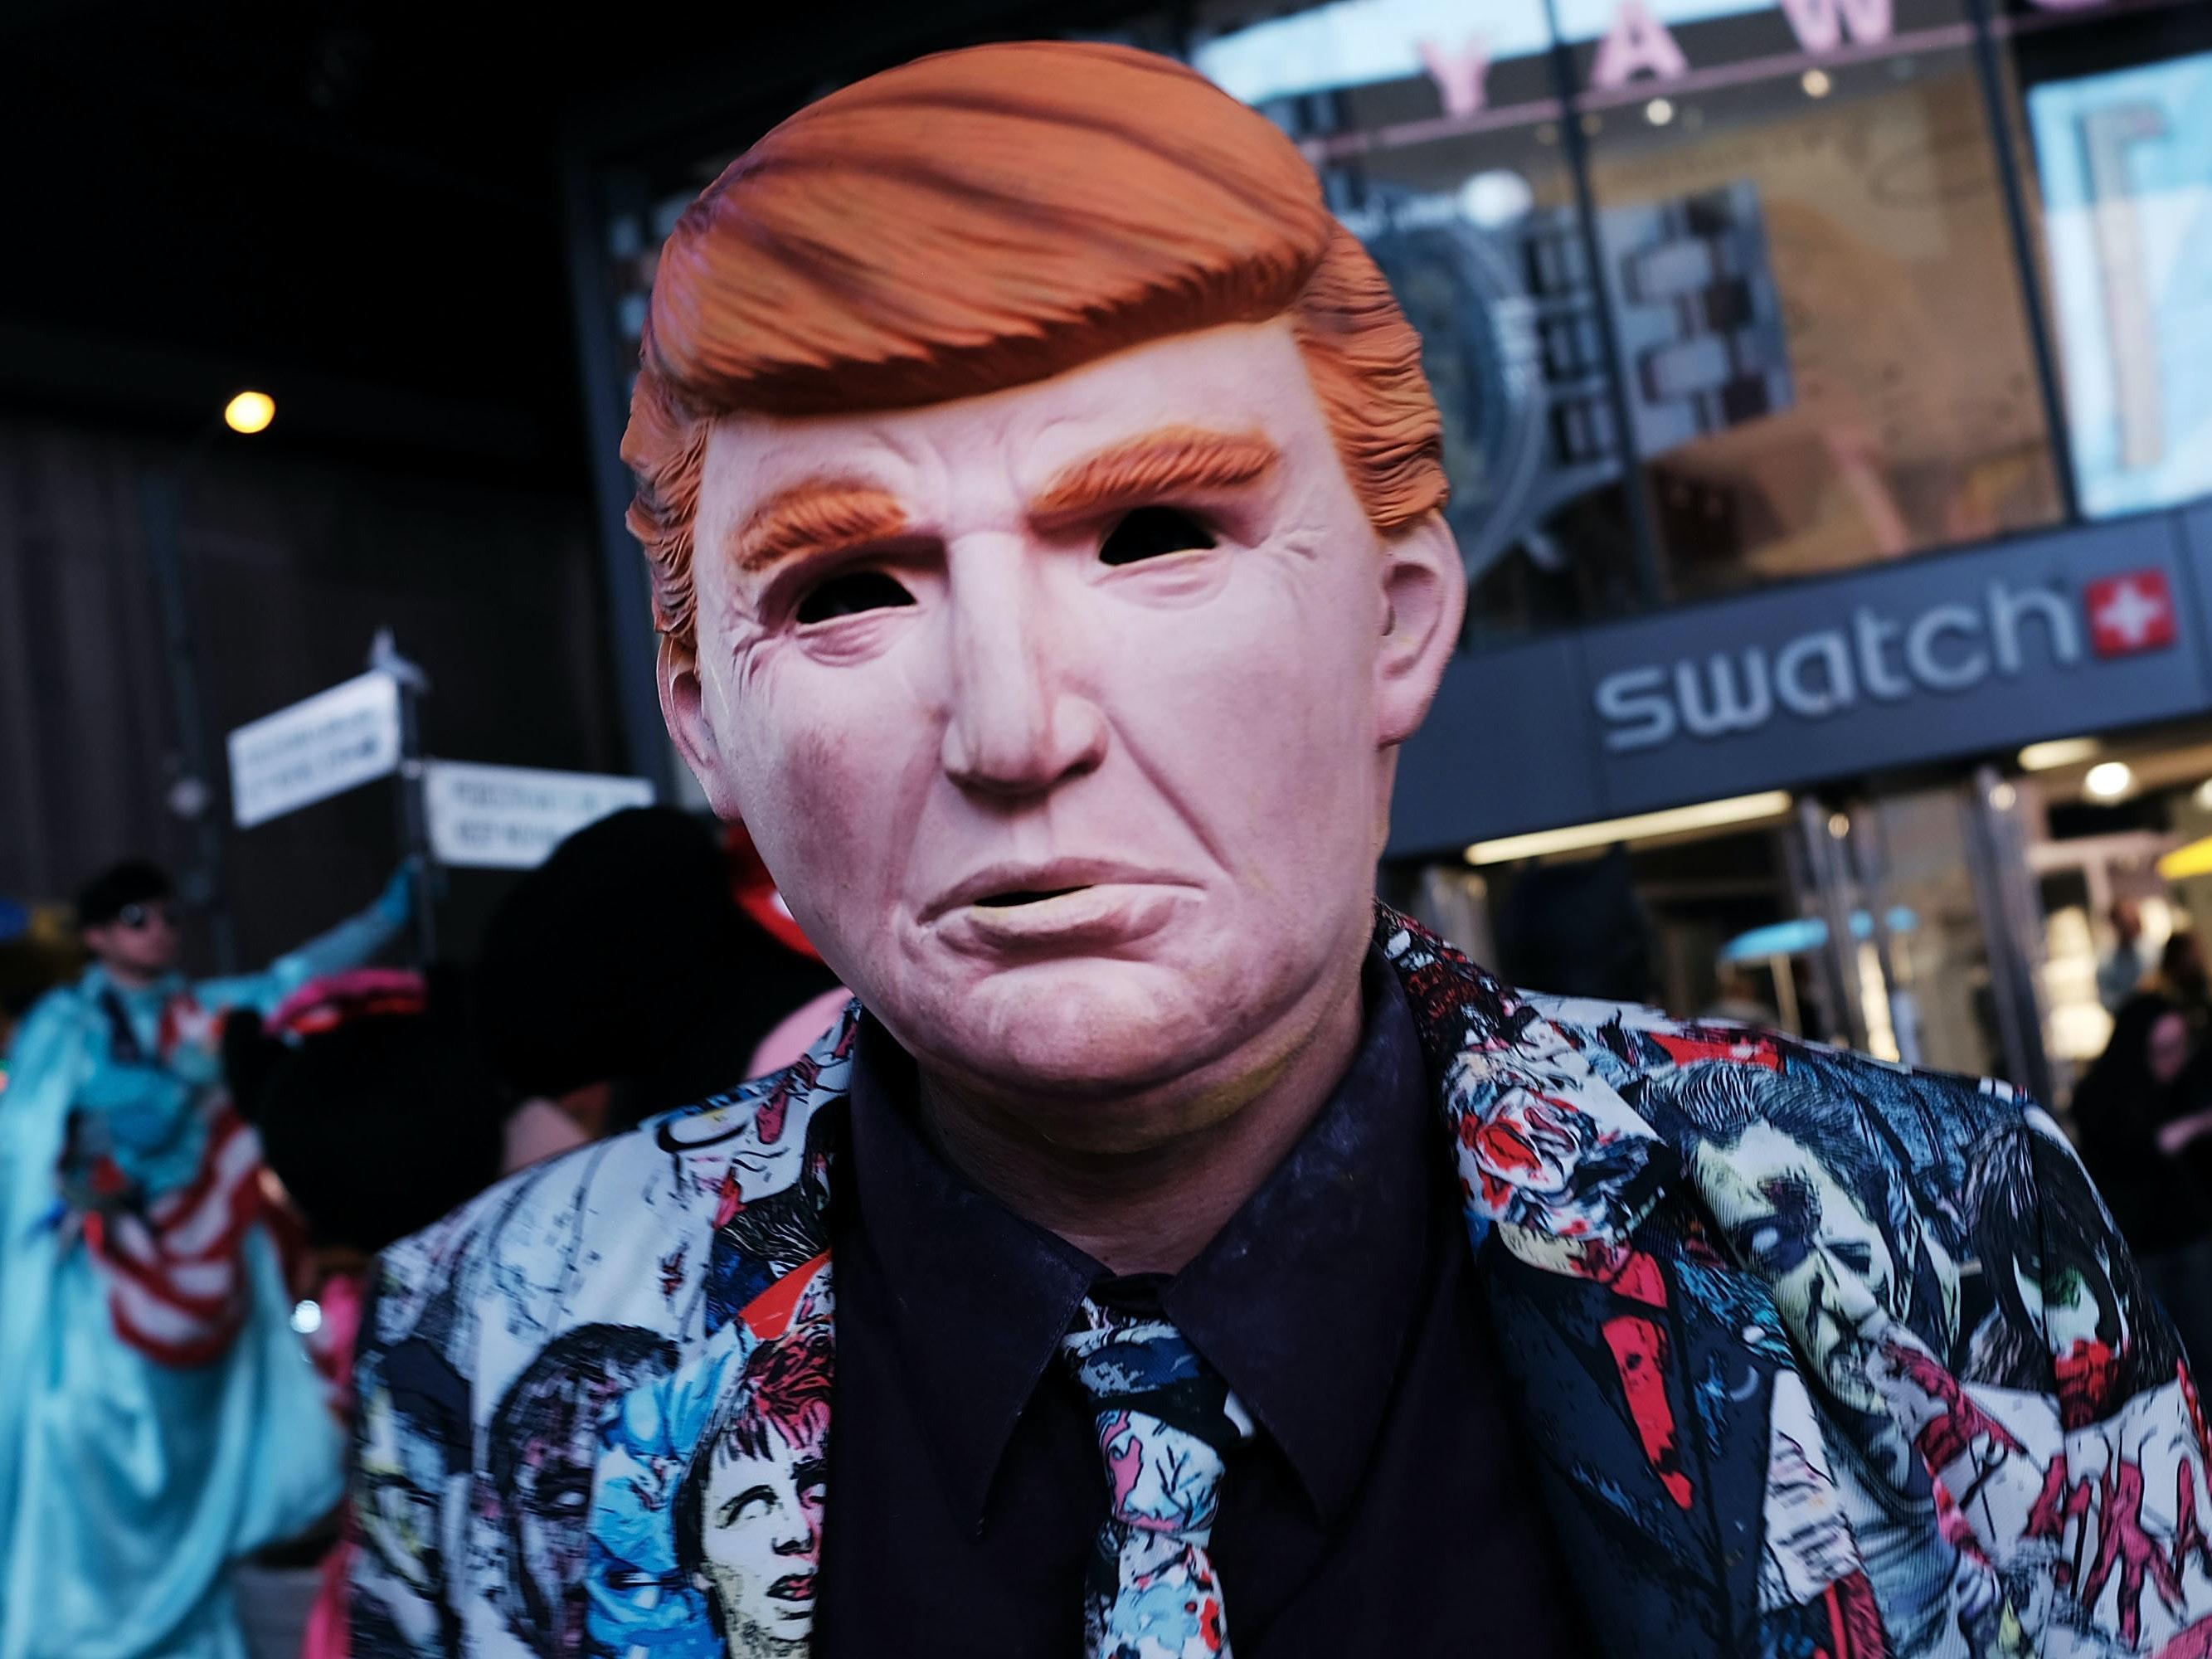 The 10 Super Villains Most Like Donald Trump